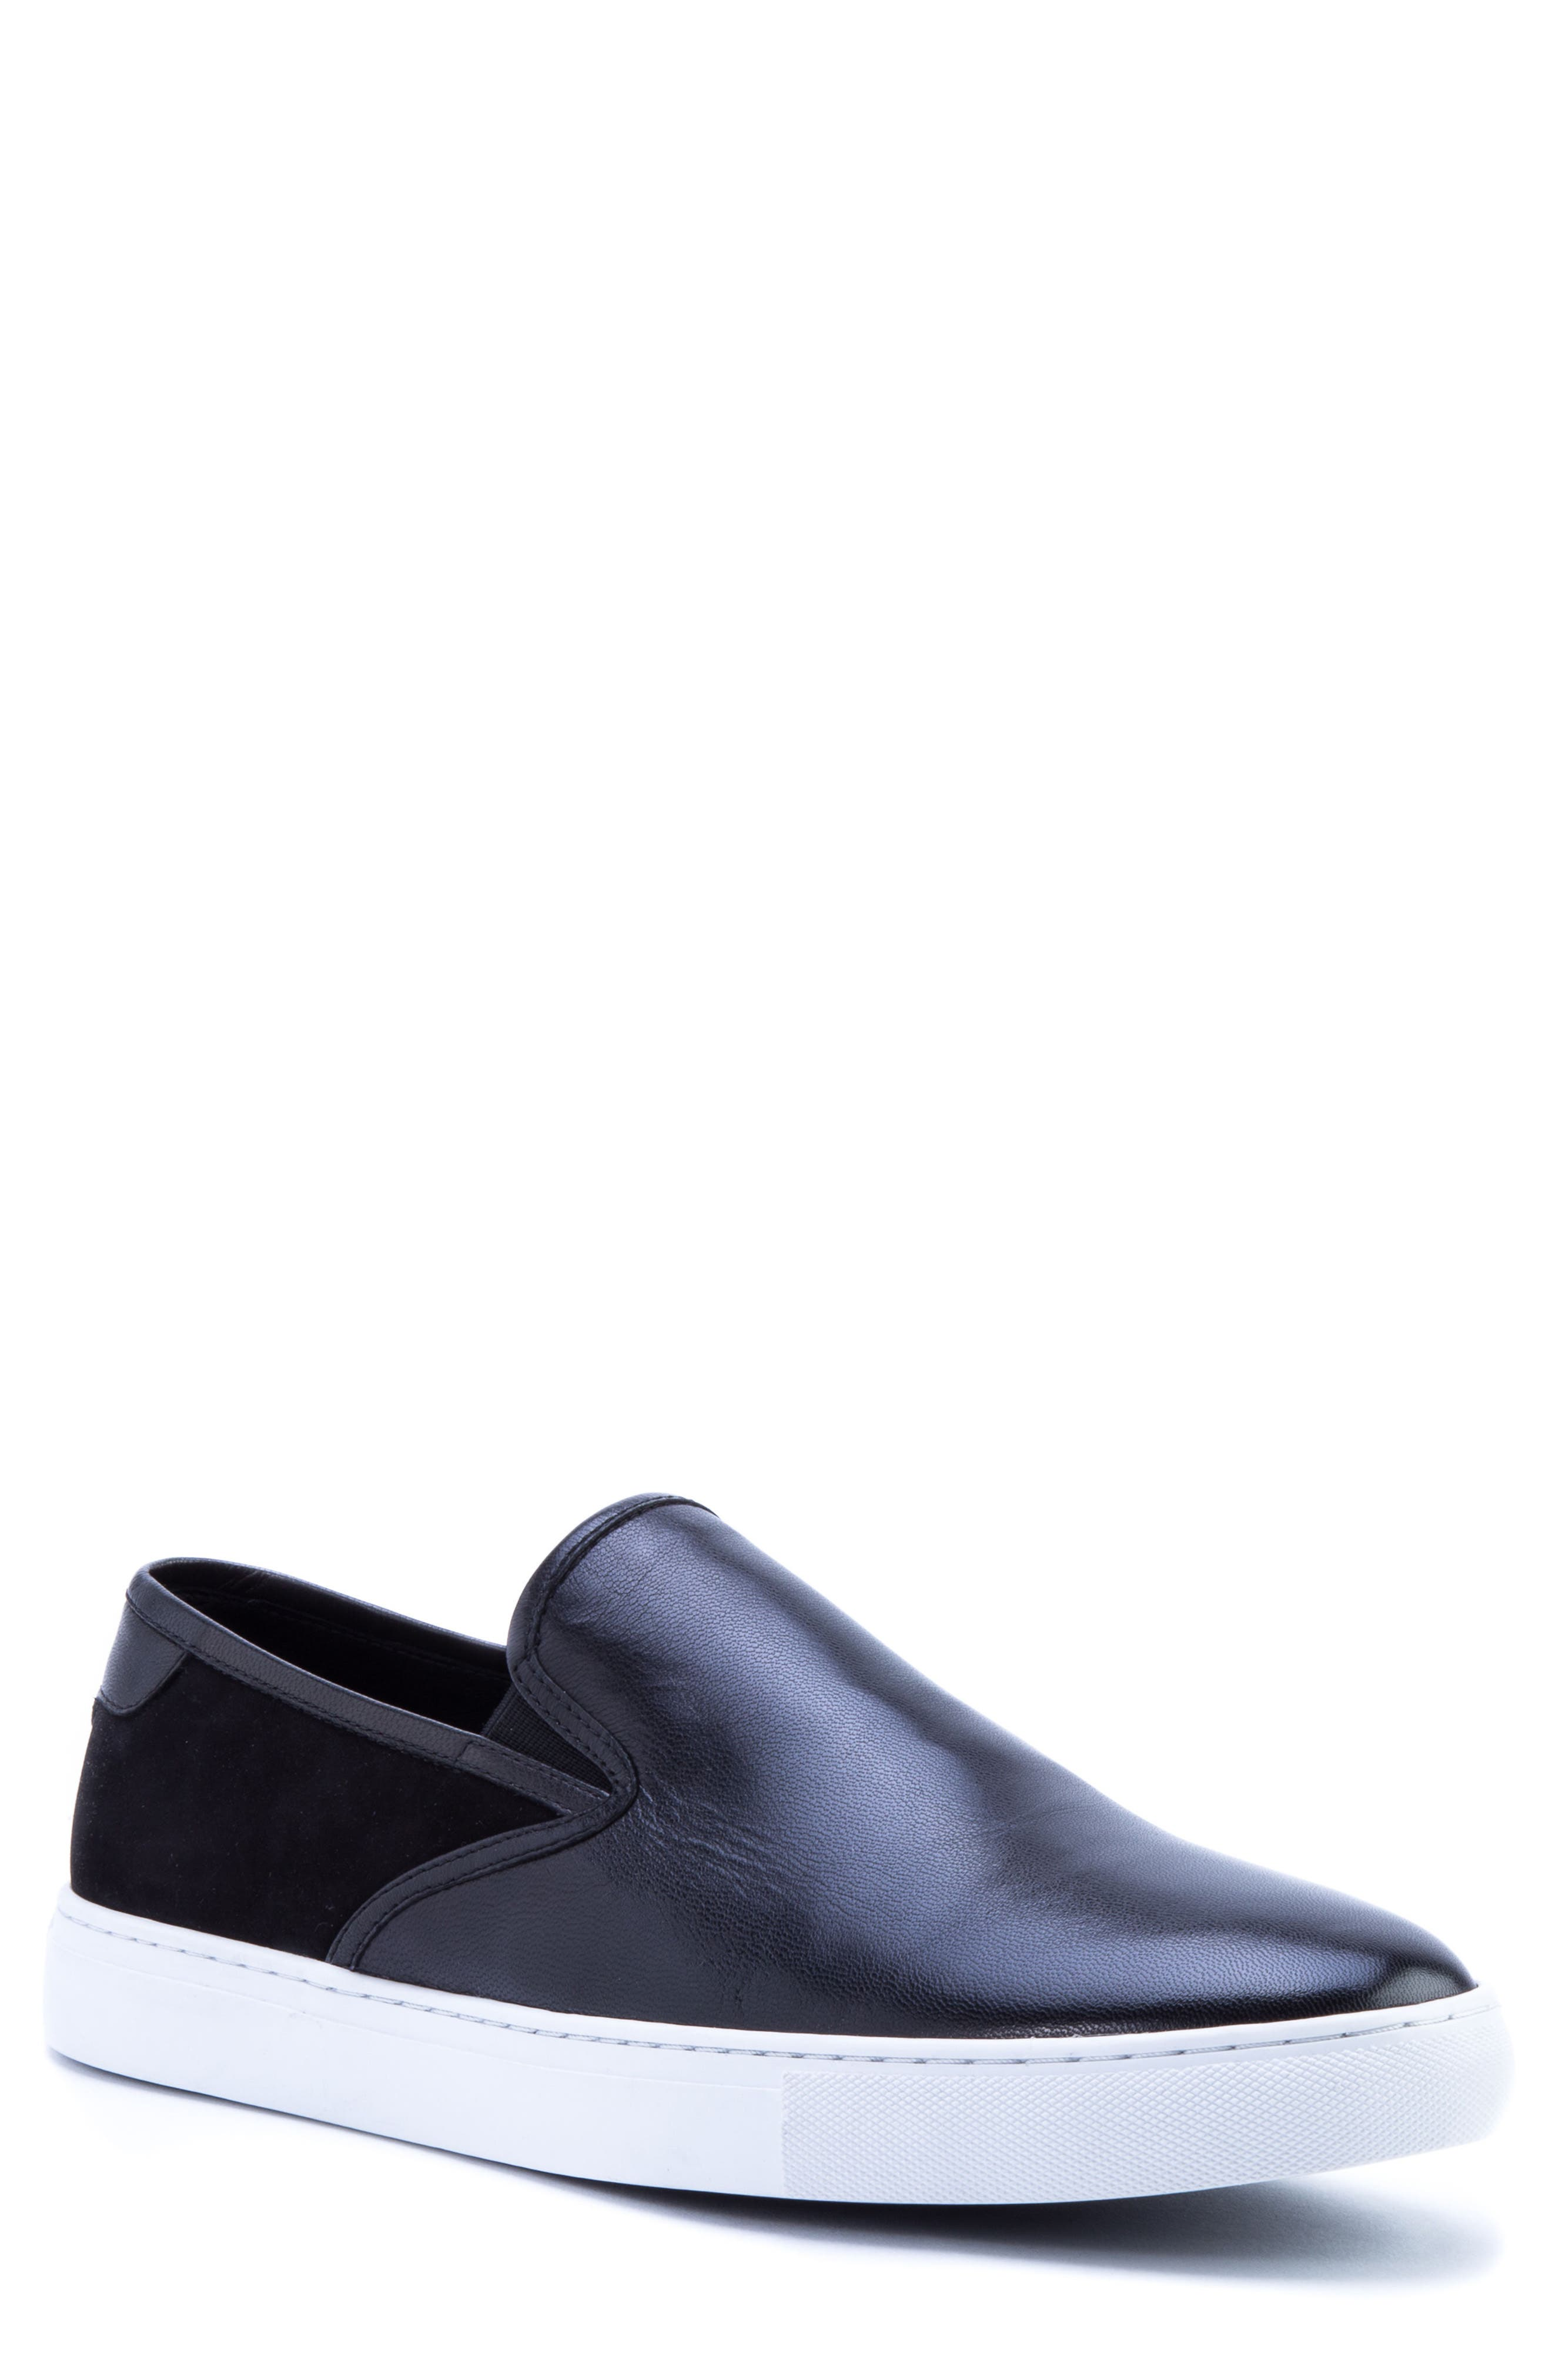 Duchamps Slip-On Sneaker,                             Main thumbnail 1, color,                             Black Leather/ Suede